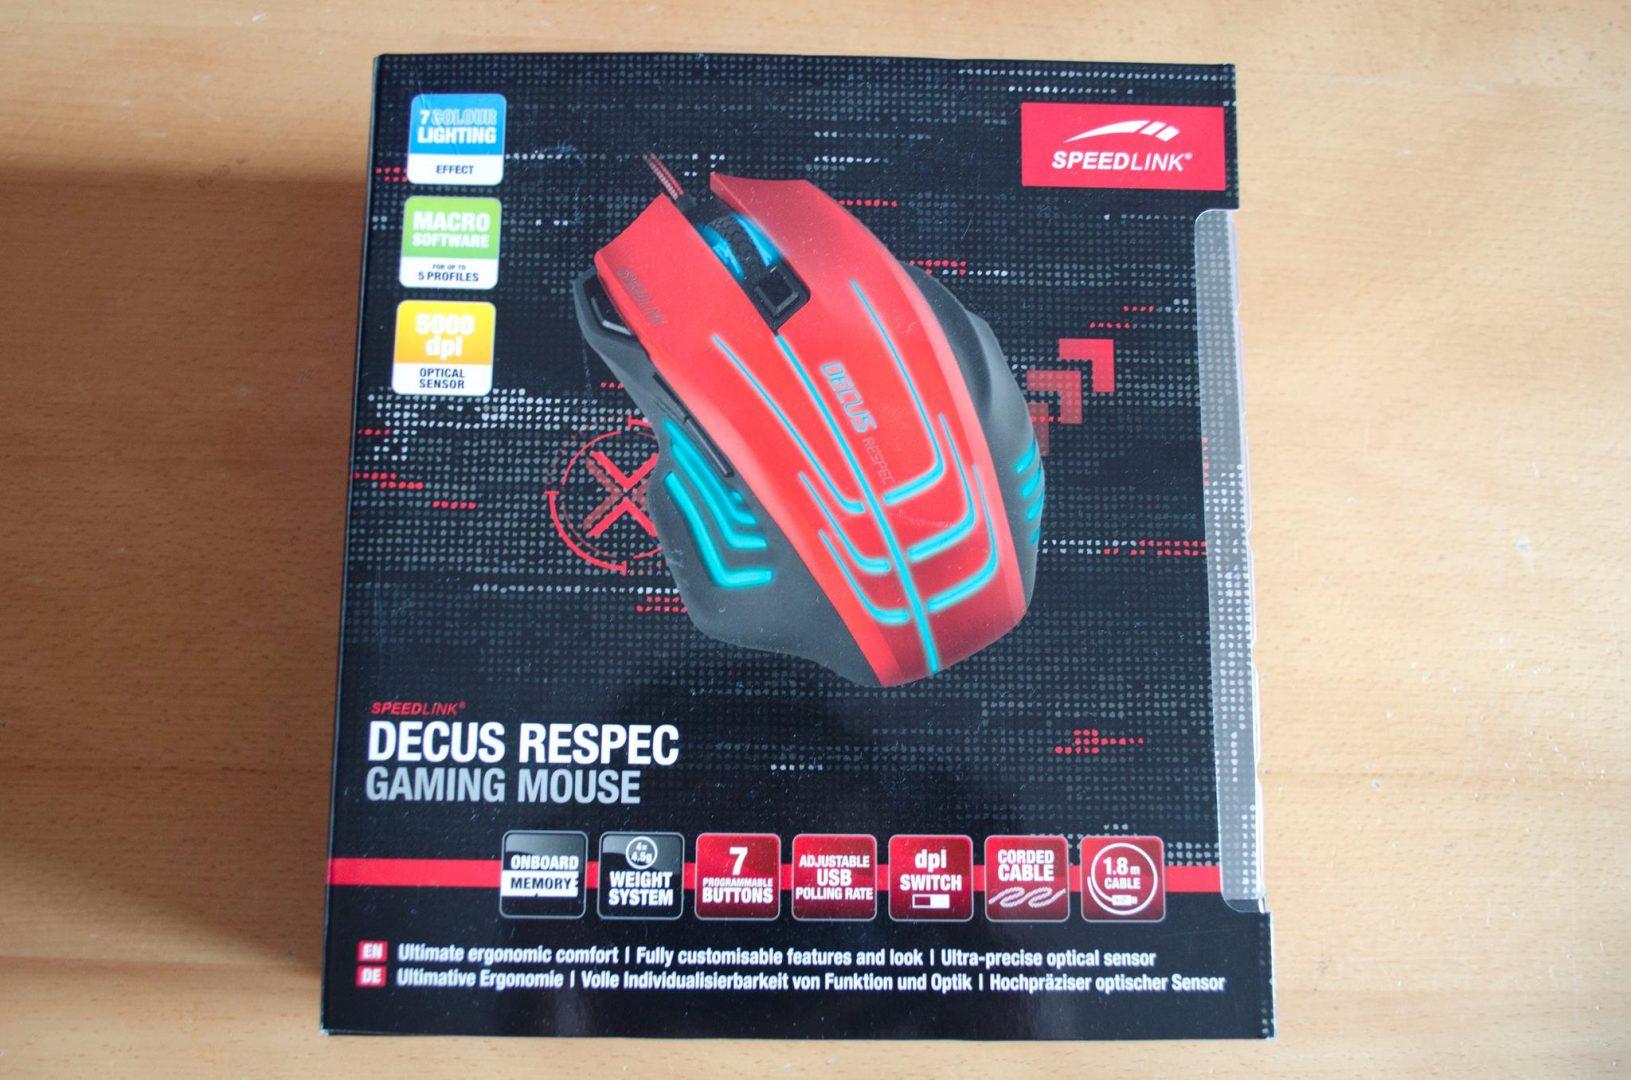 speedlink decus respec gaming mouse review_10